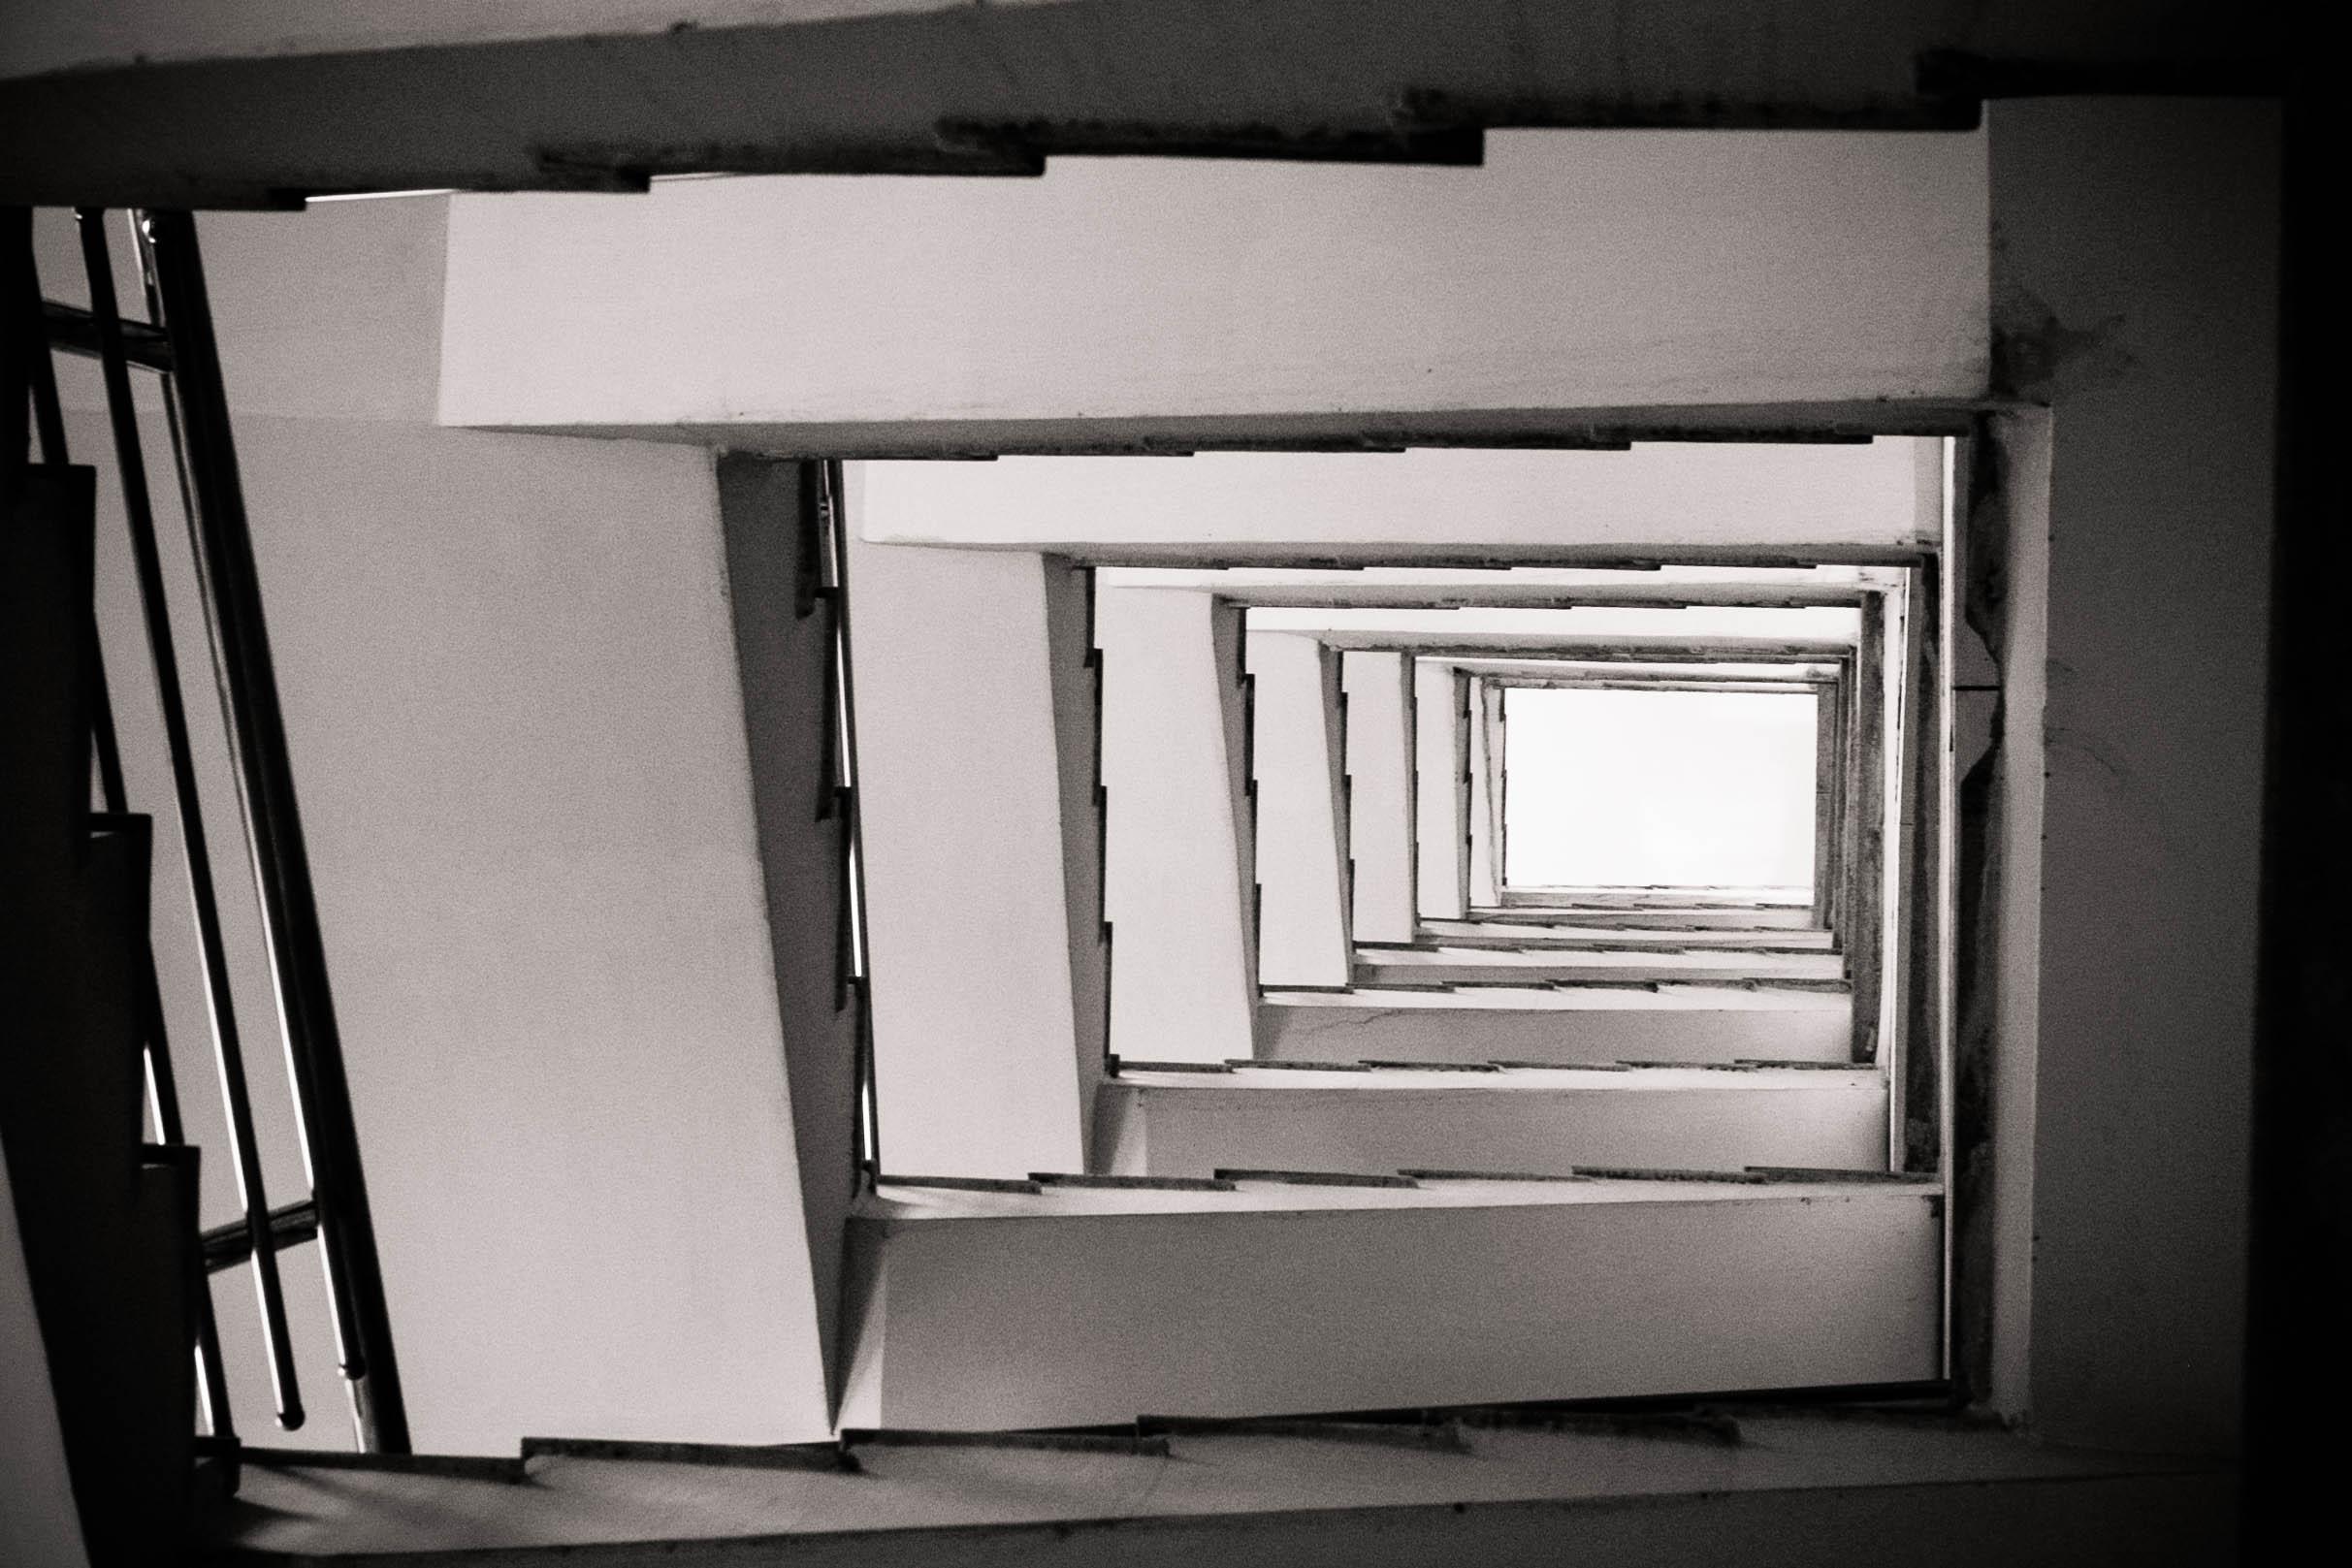 Fondos de pantalla monocromo ventana arquitectura for Disenos de interiores en blanco y negro